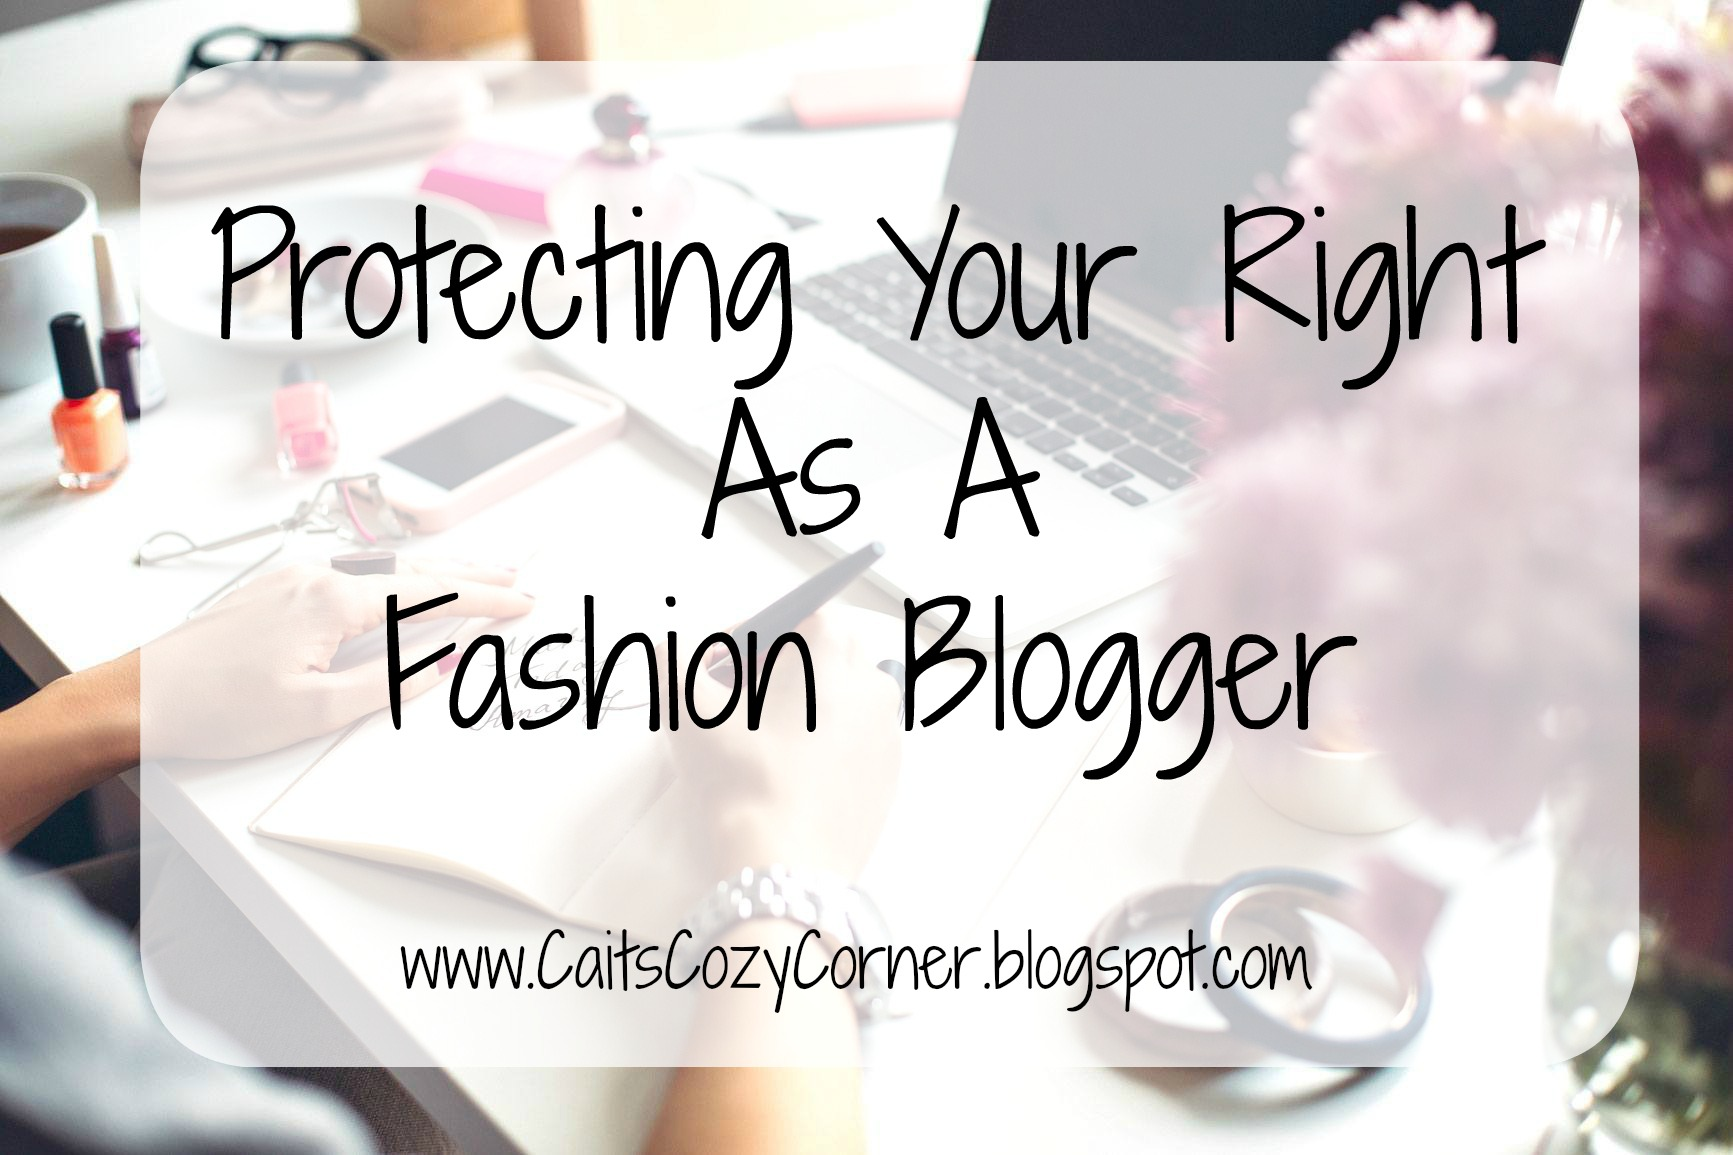 Melodie Stewart, The Style Klazit, CaitCozyCorner.blogspot.com, Rights As A Fashion Blogger